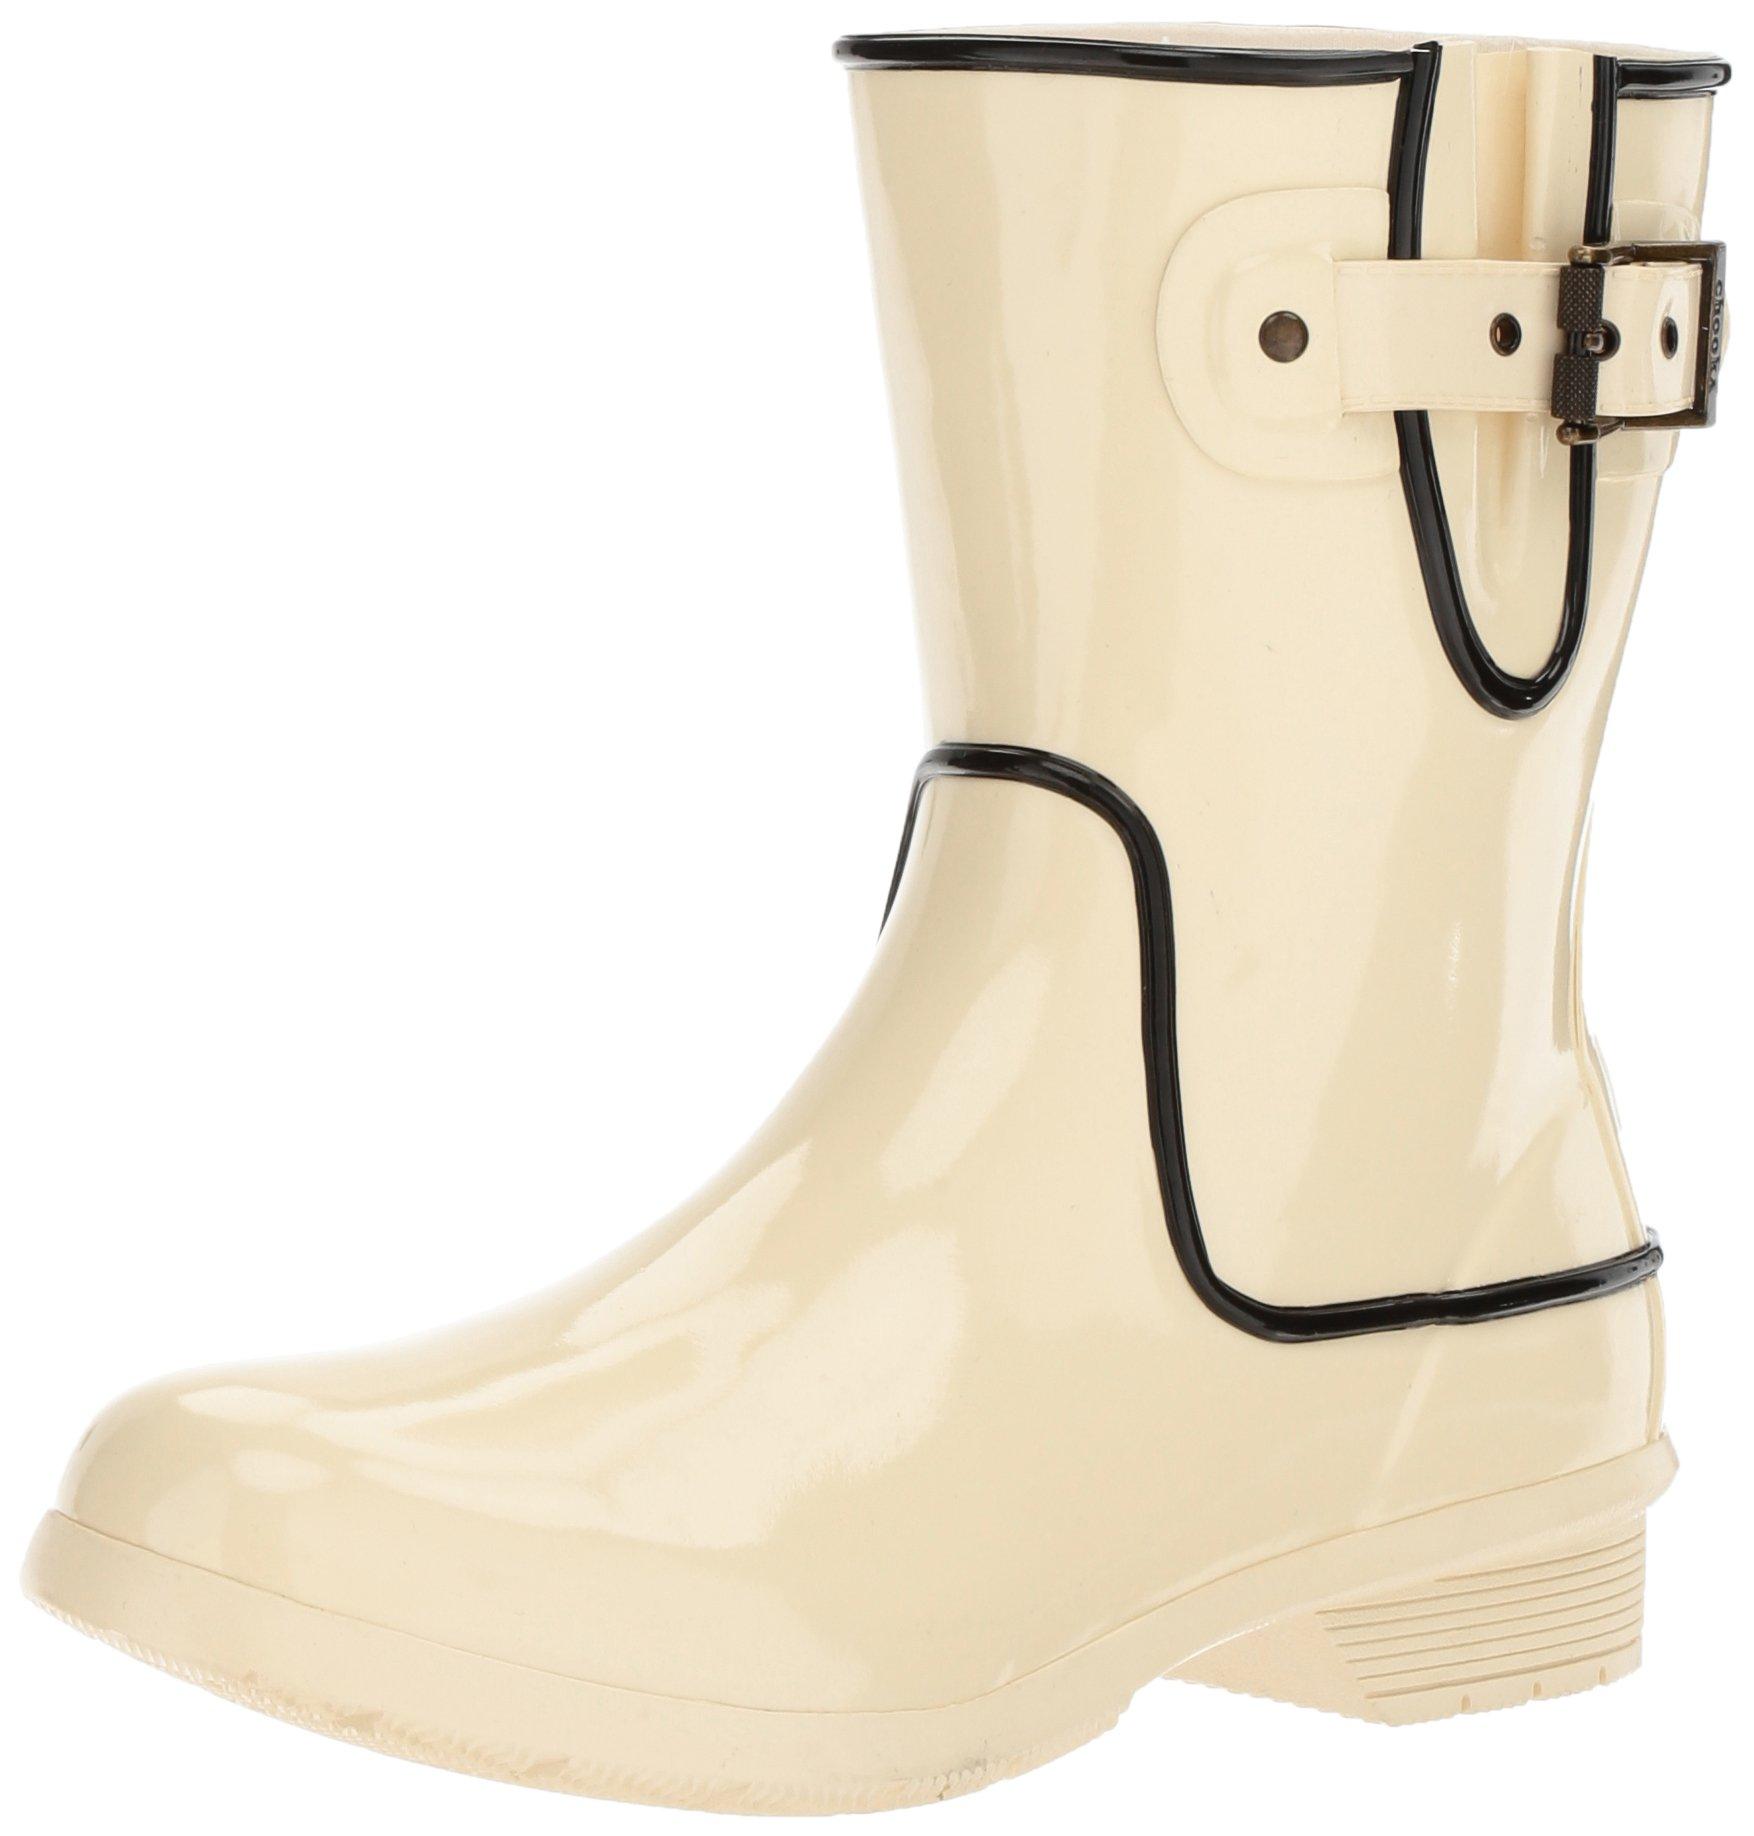 Chooka Women's Waterproof Mid-Height Printed Memory Foam Rain Boot, Fine Line Ivory, 9 M US